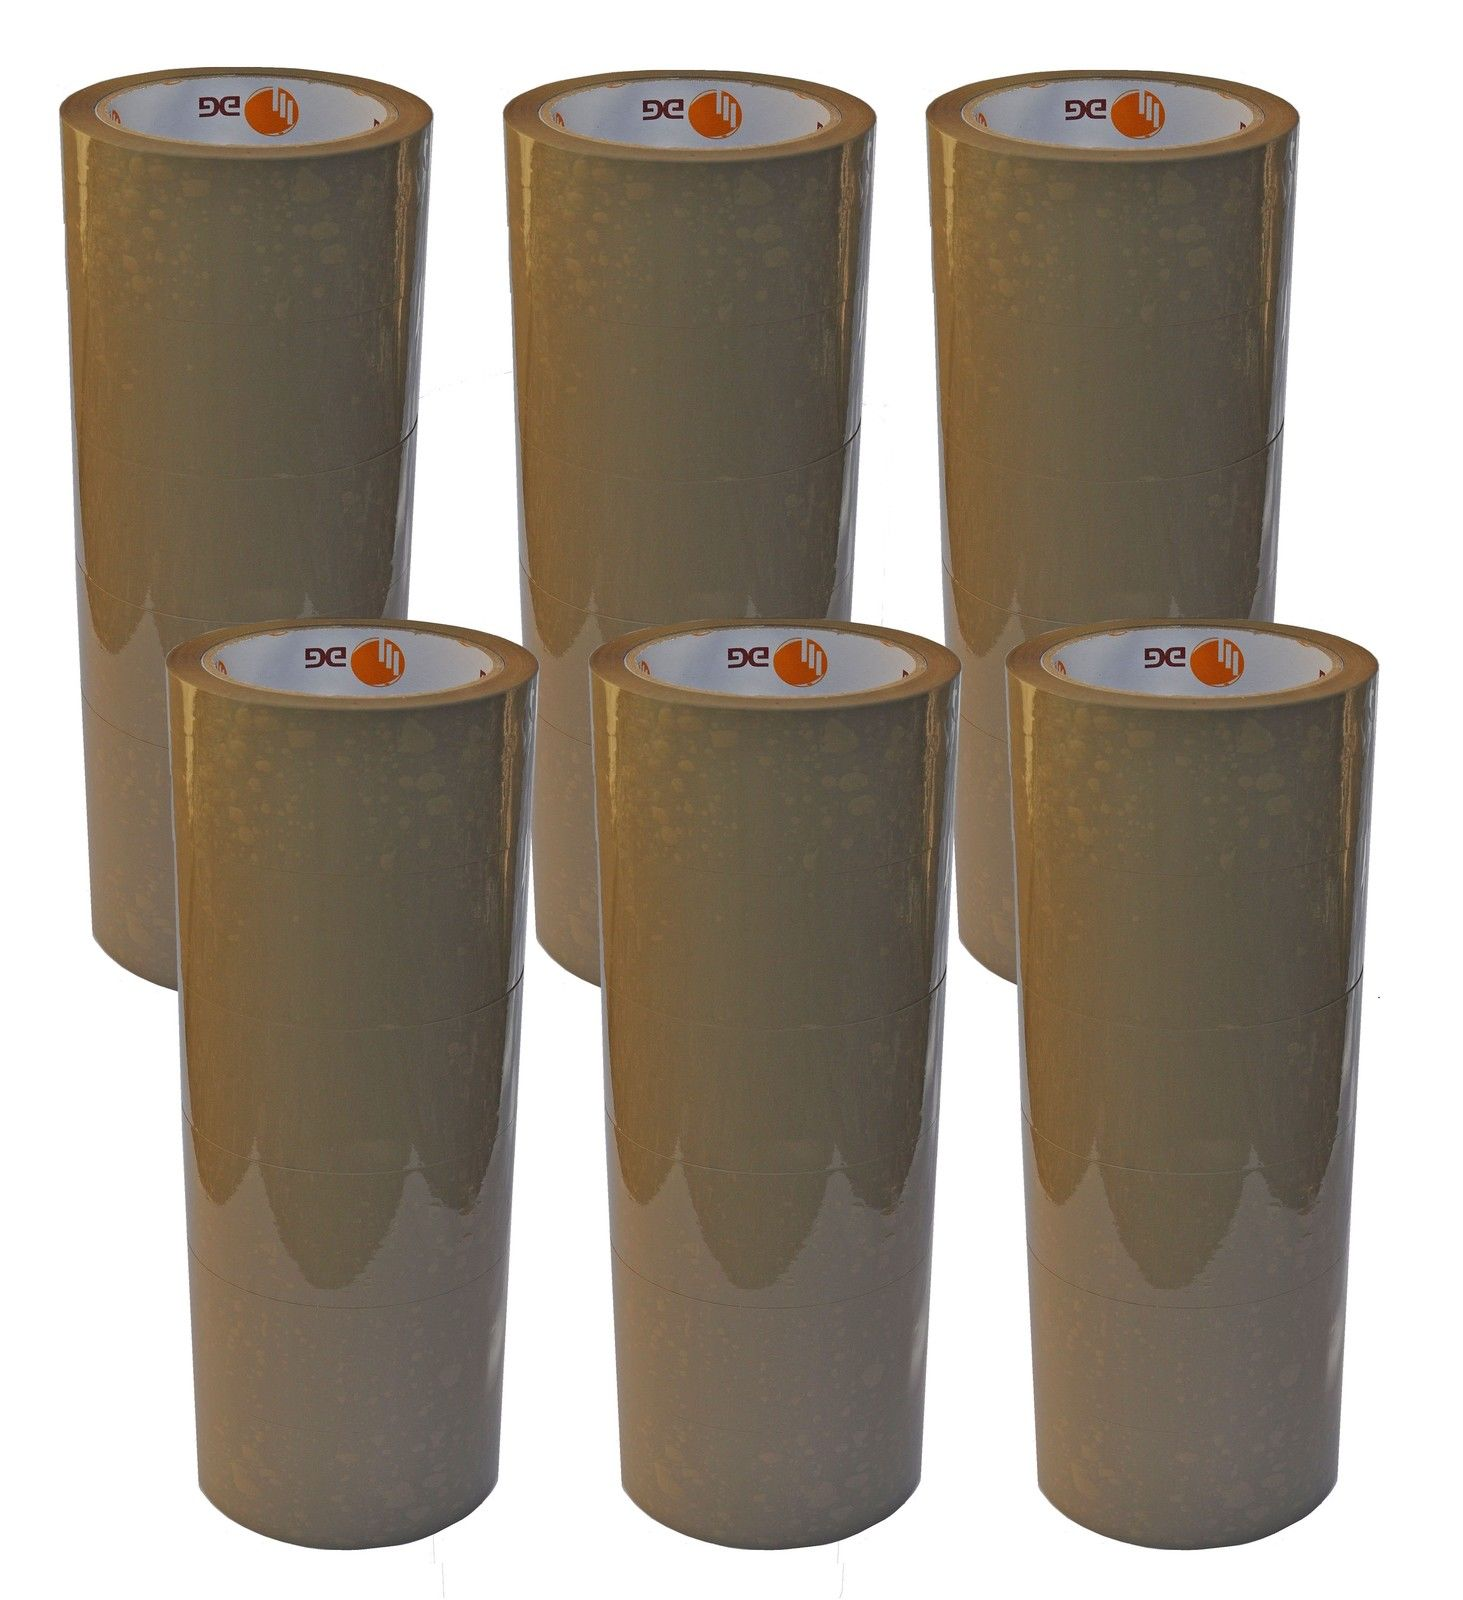 36 Rollen Paketklebeband Kleberollen Packband transparent 66m